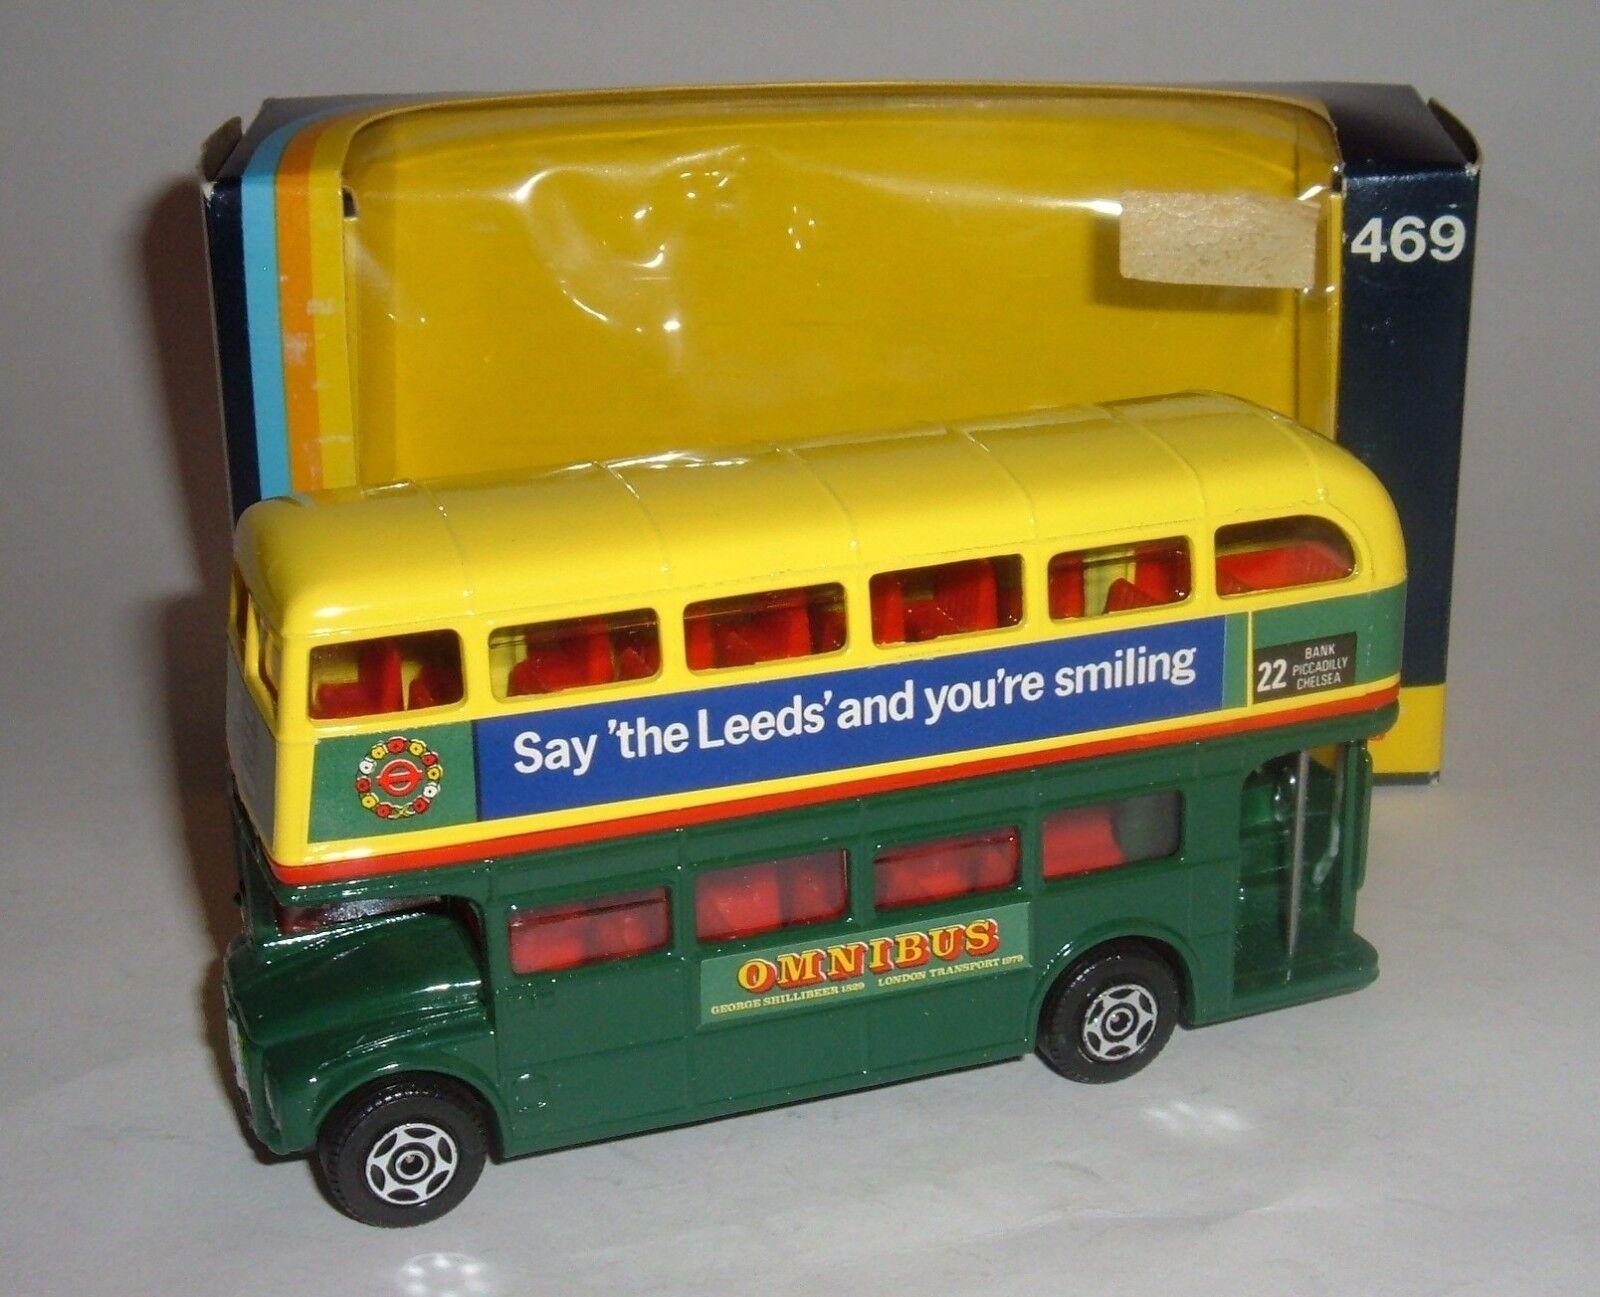 Corgi Toys No. 469, London Routemaster Bus - Leeds Building Society, - Superb.